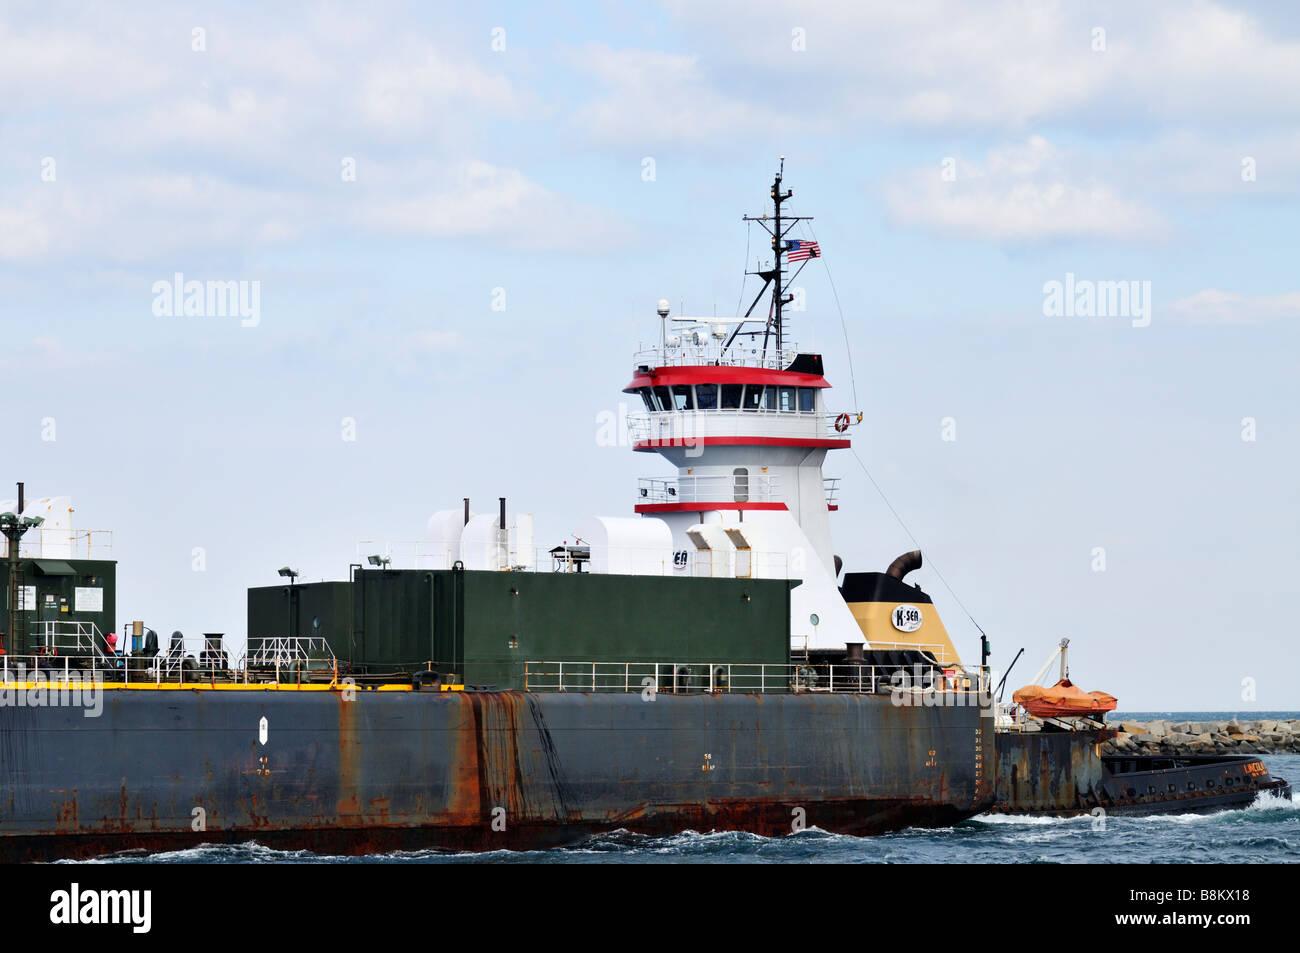 Side profile of a Tugboat pushing